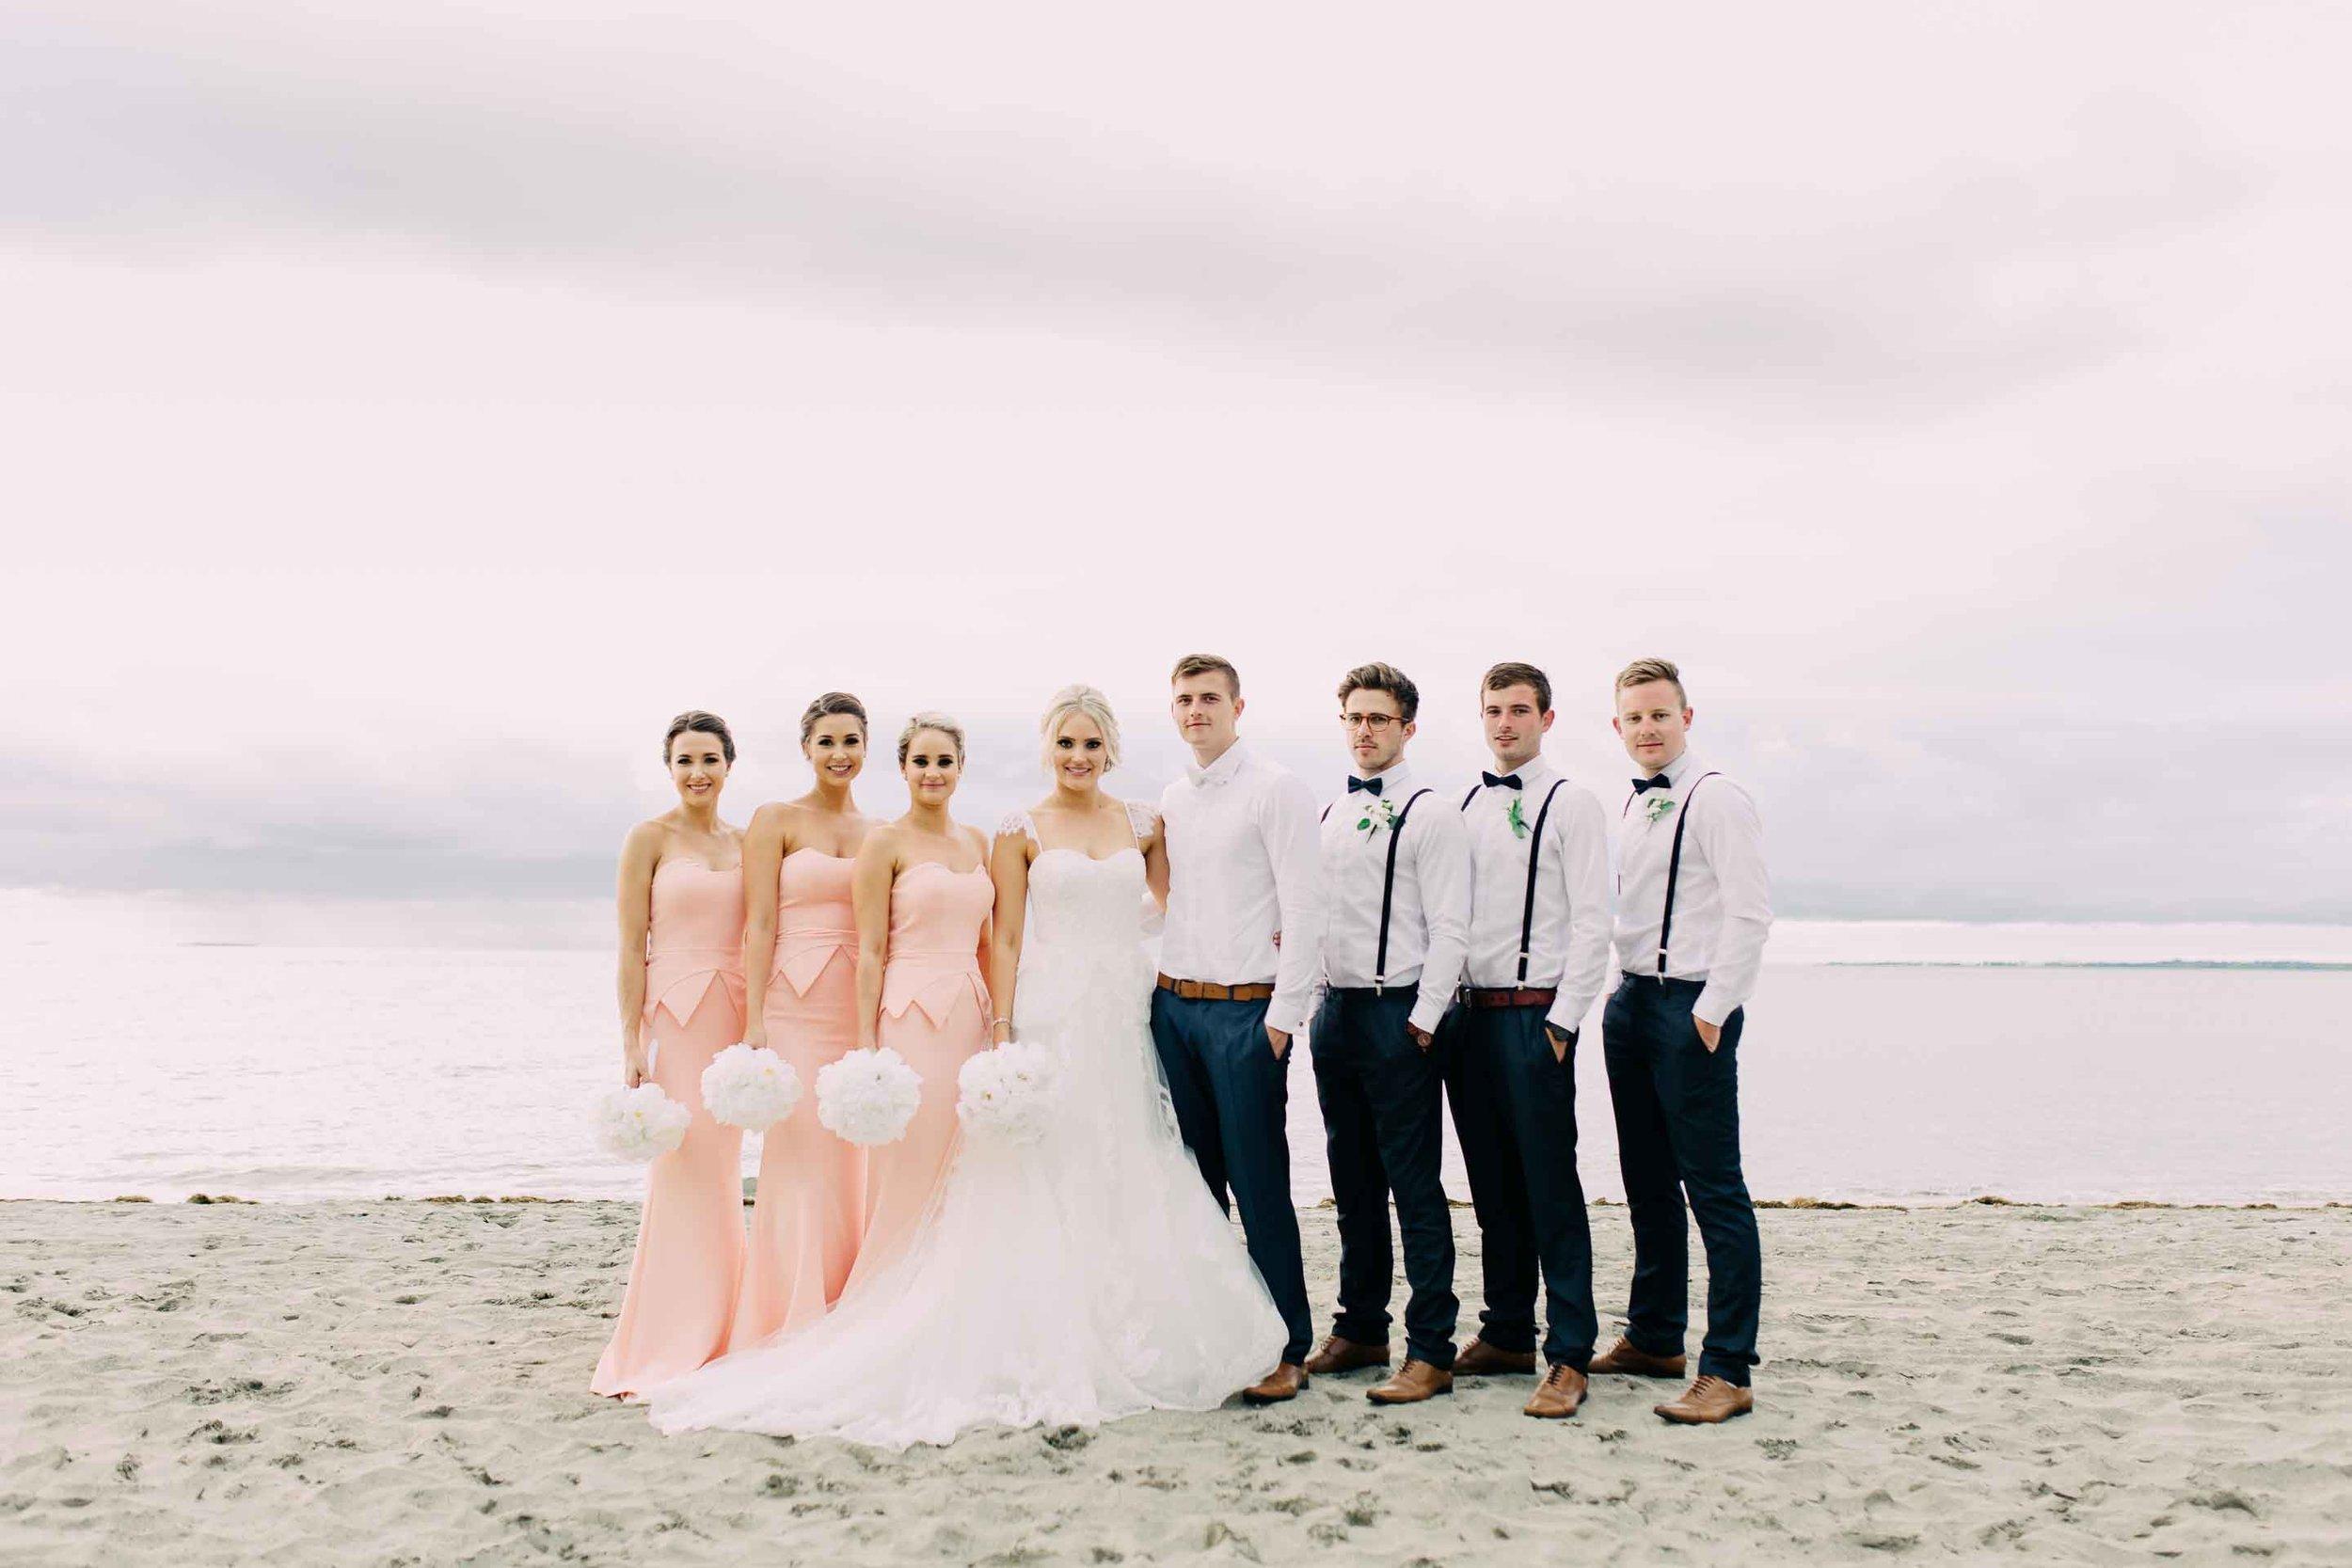 Stylish Bridal Party on the beach Hilton Fiji.